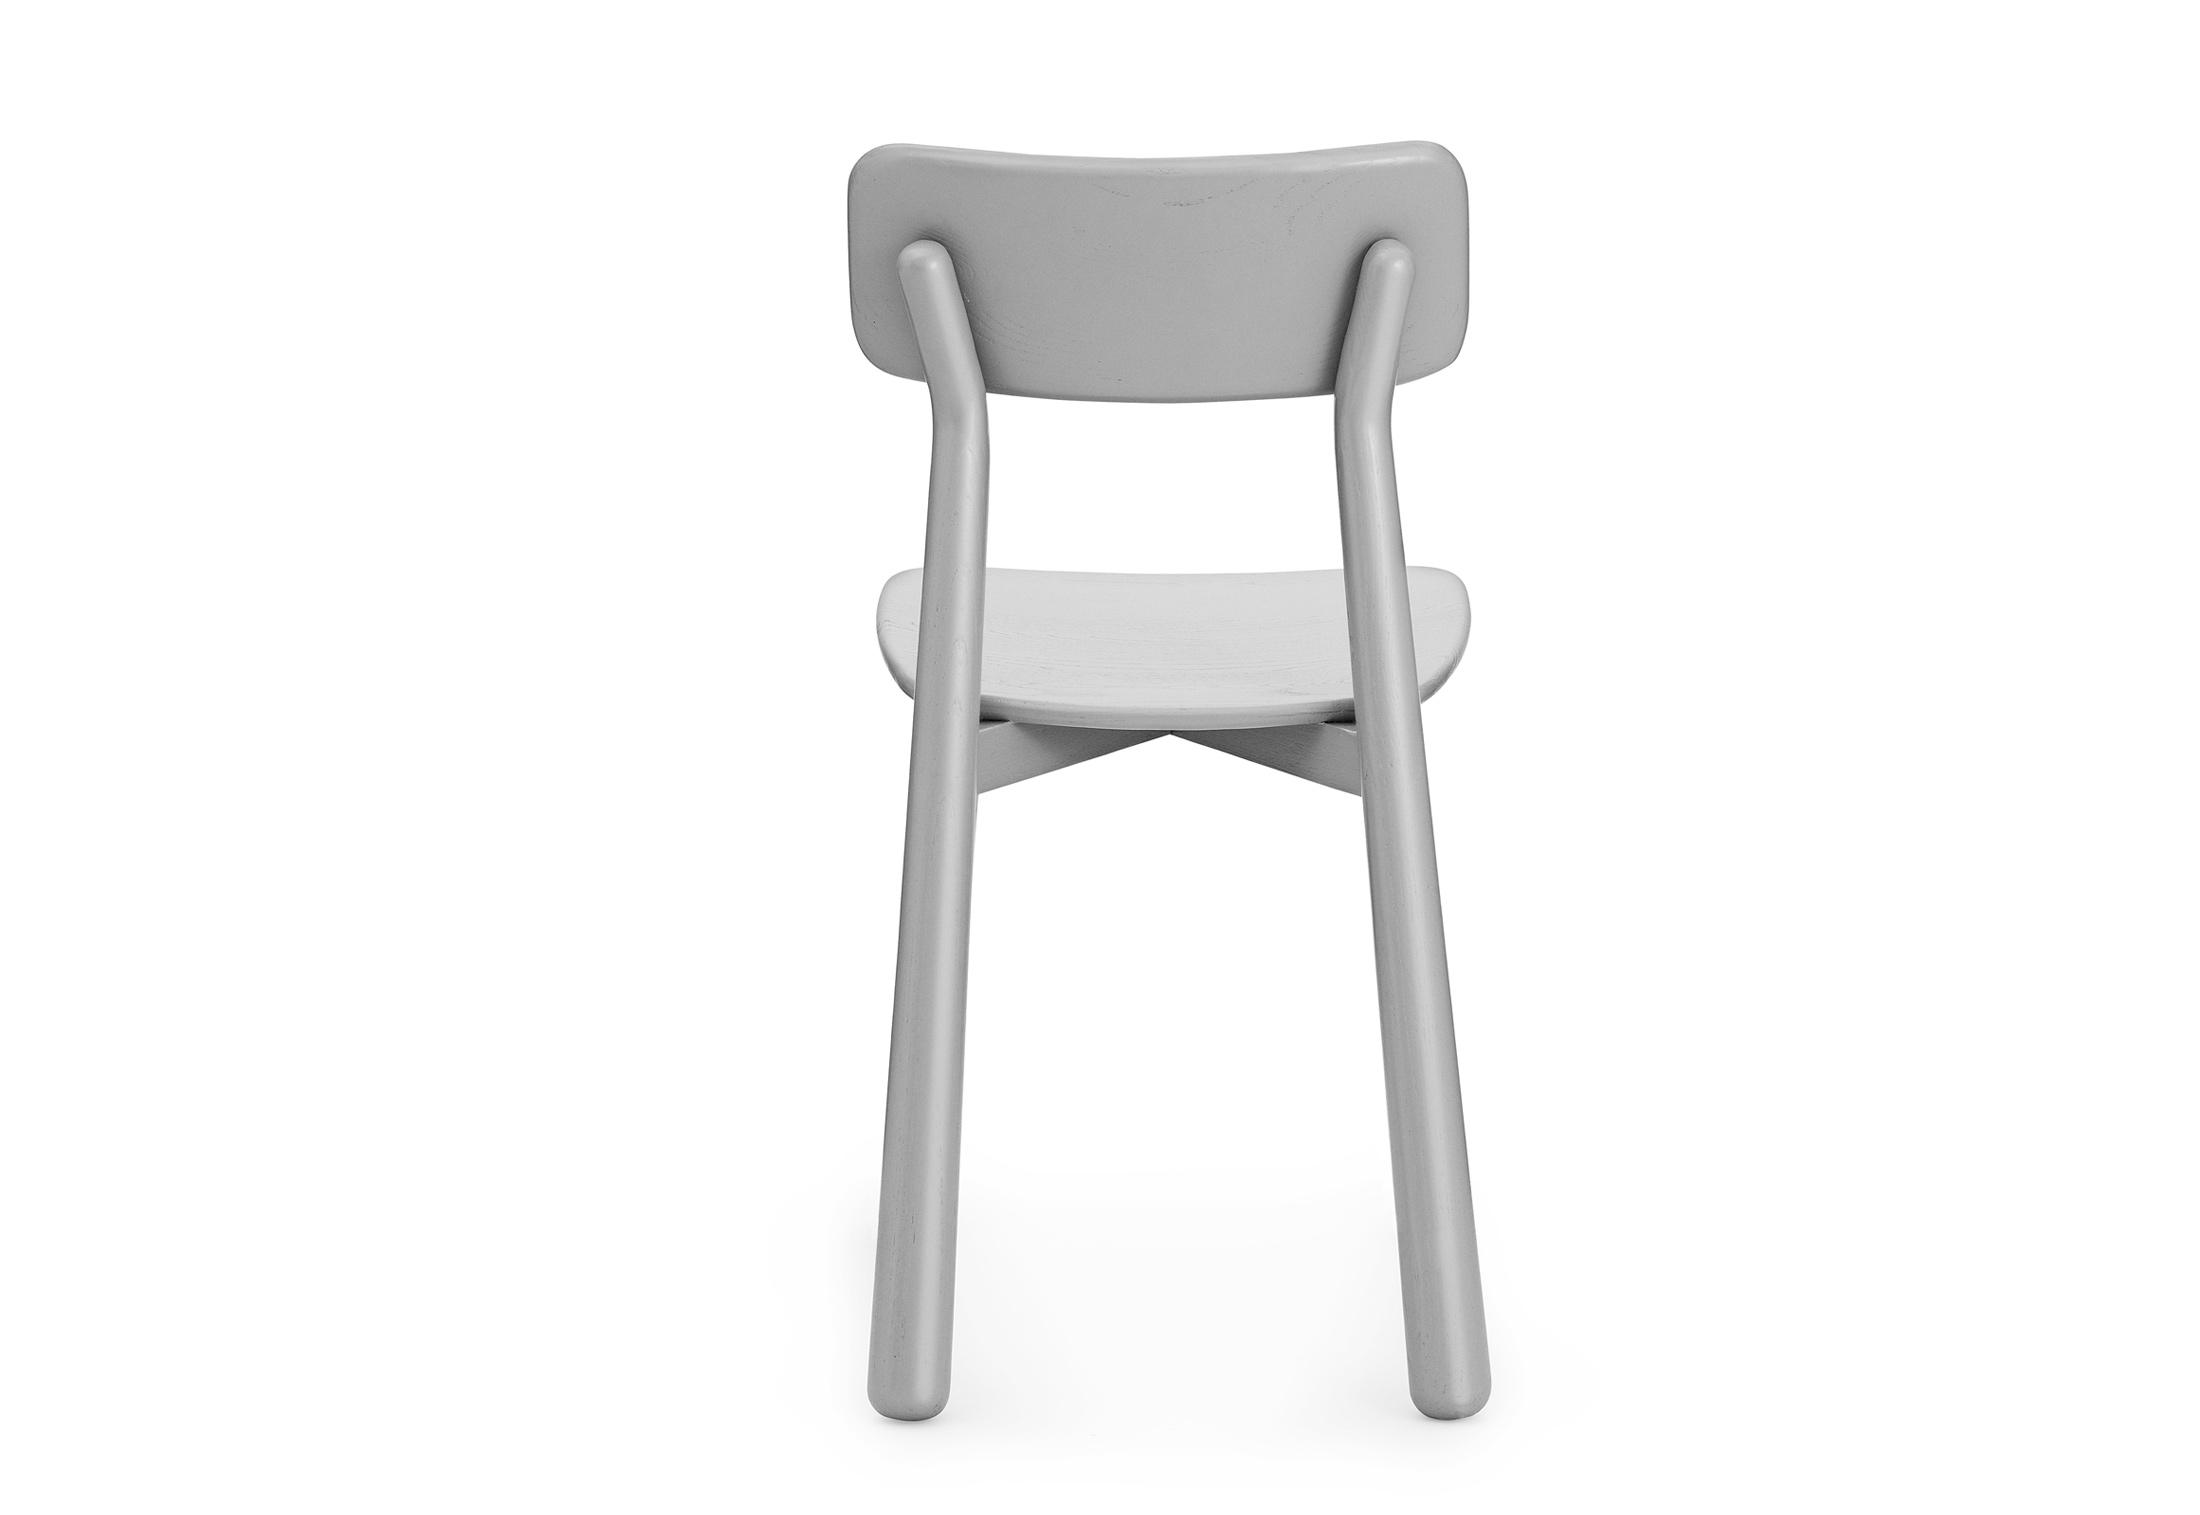 bop stuhl von normann copenhagen stylepark. Black Bedroom Furniture Sets. Home Design Ideas